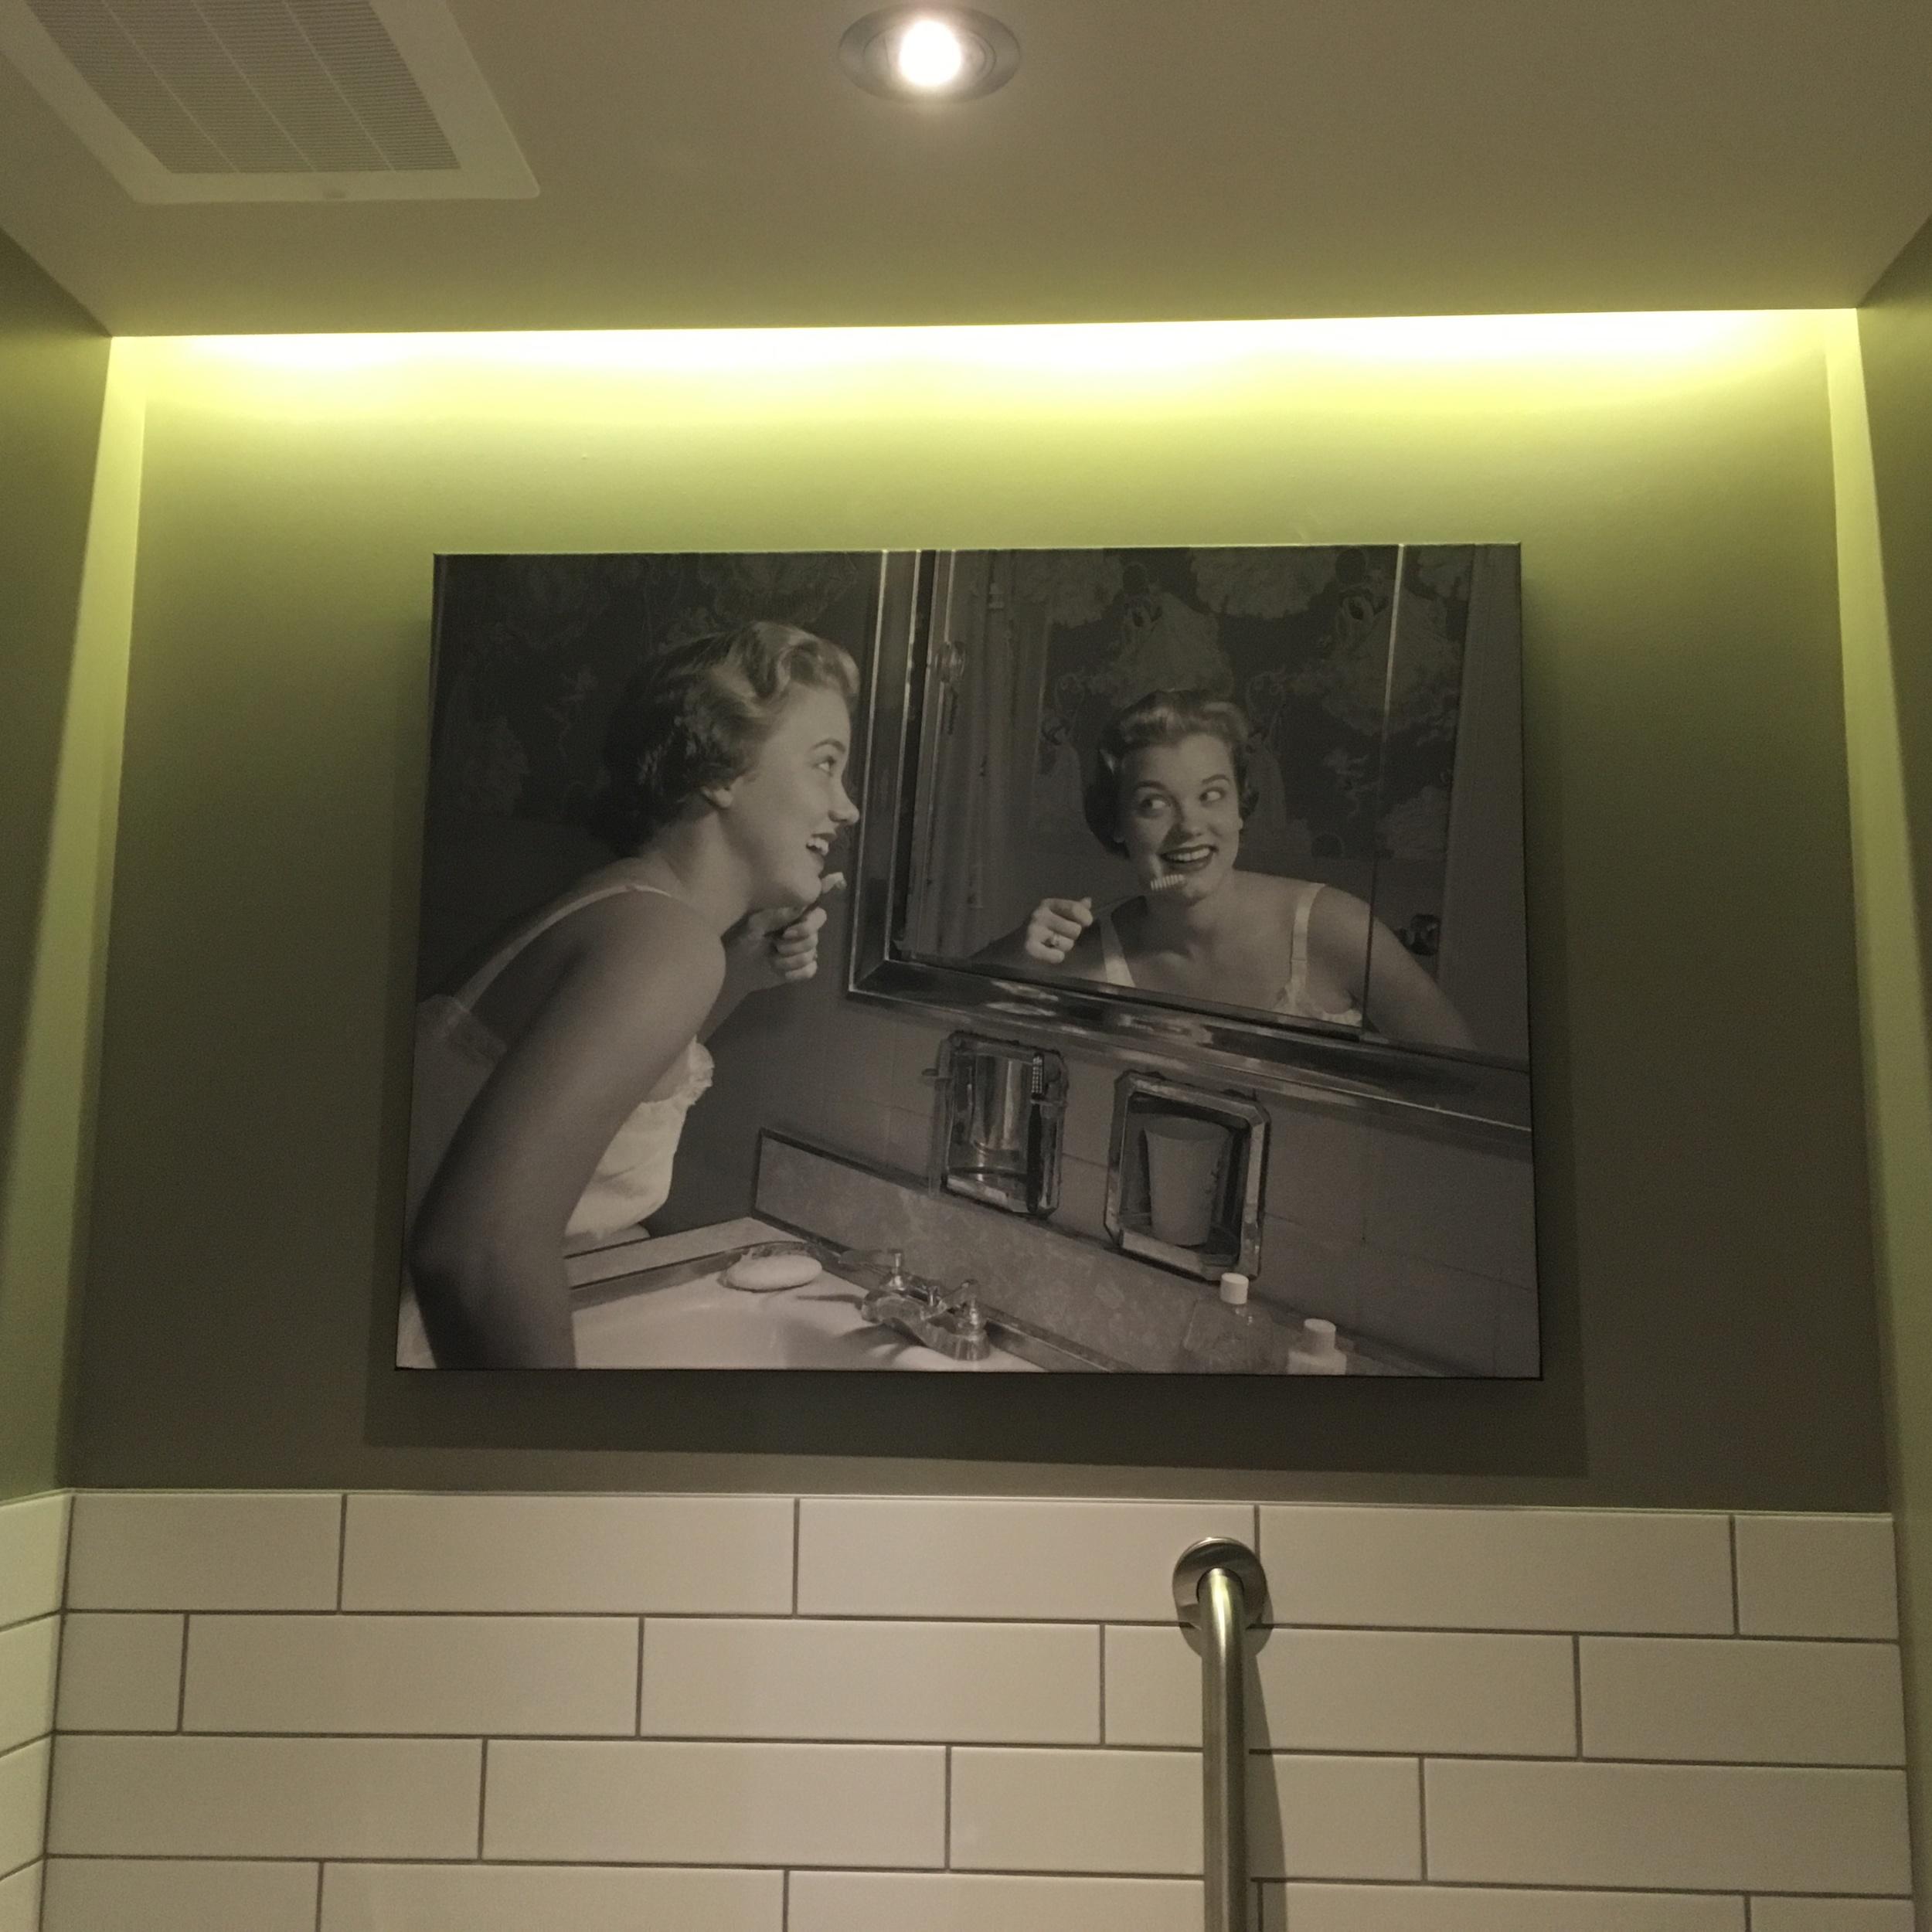 Yep, that's our bathroom